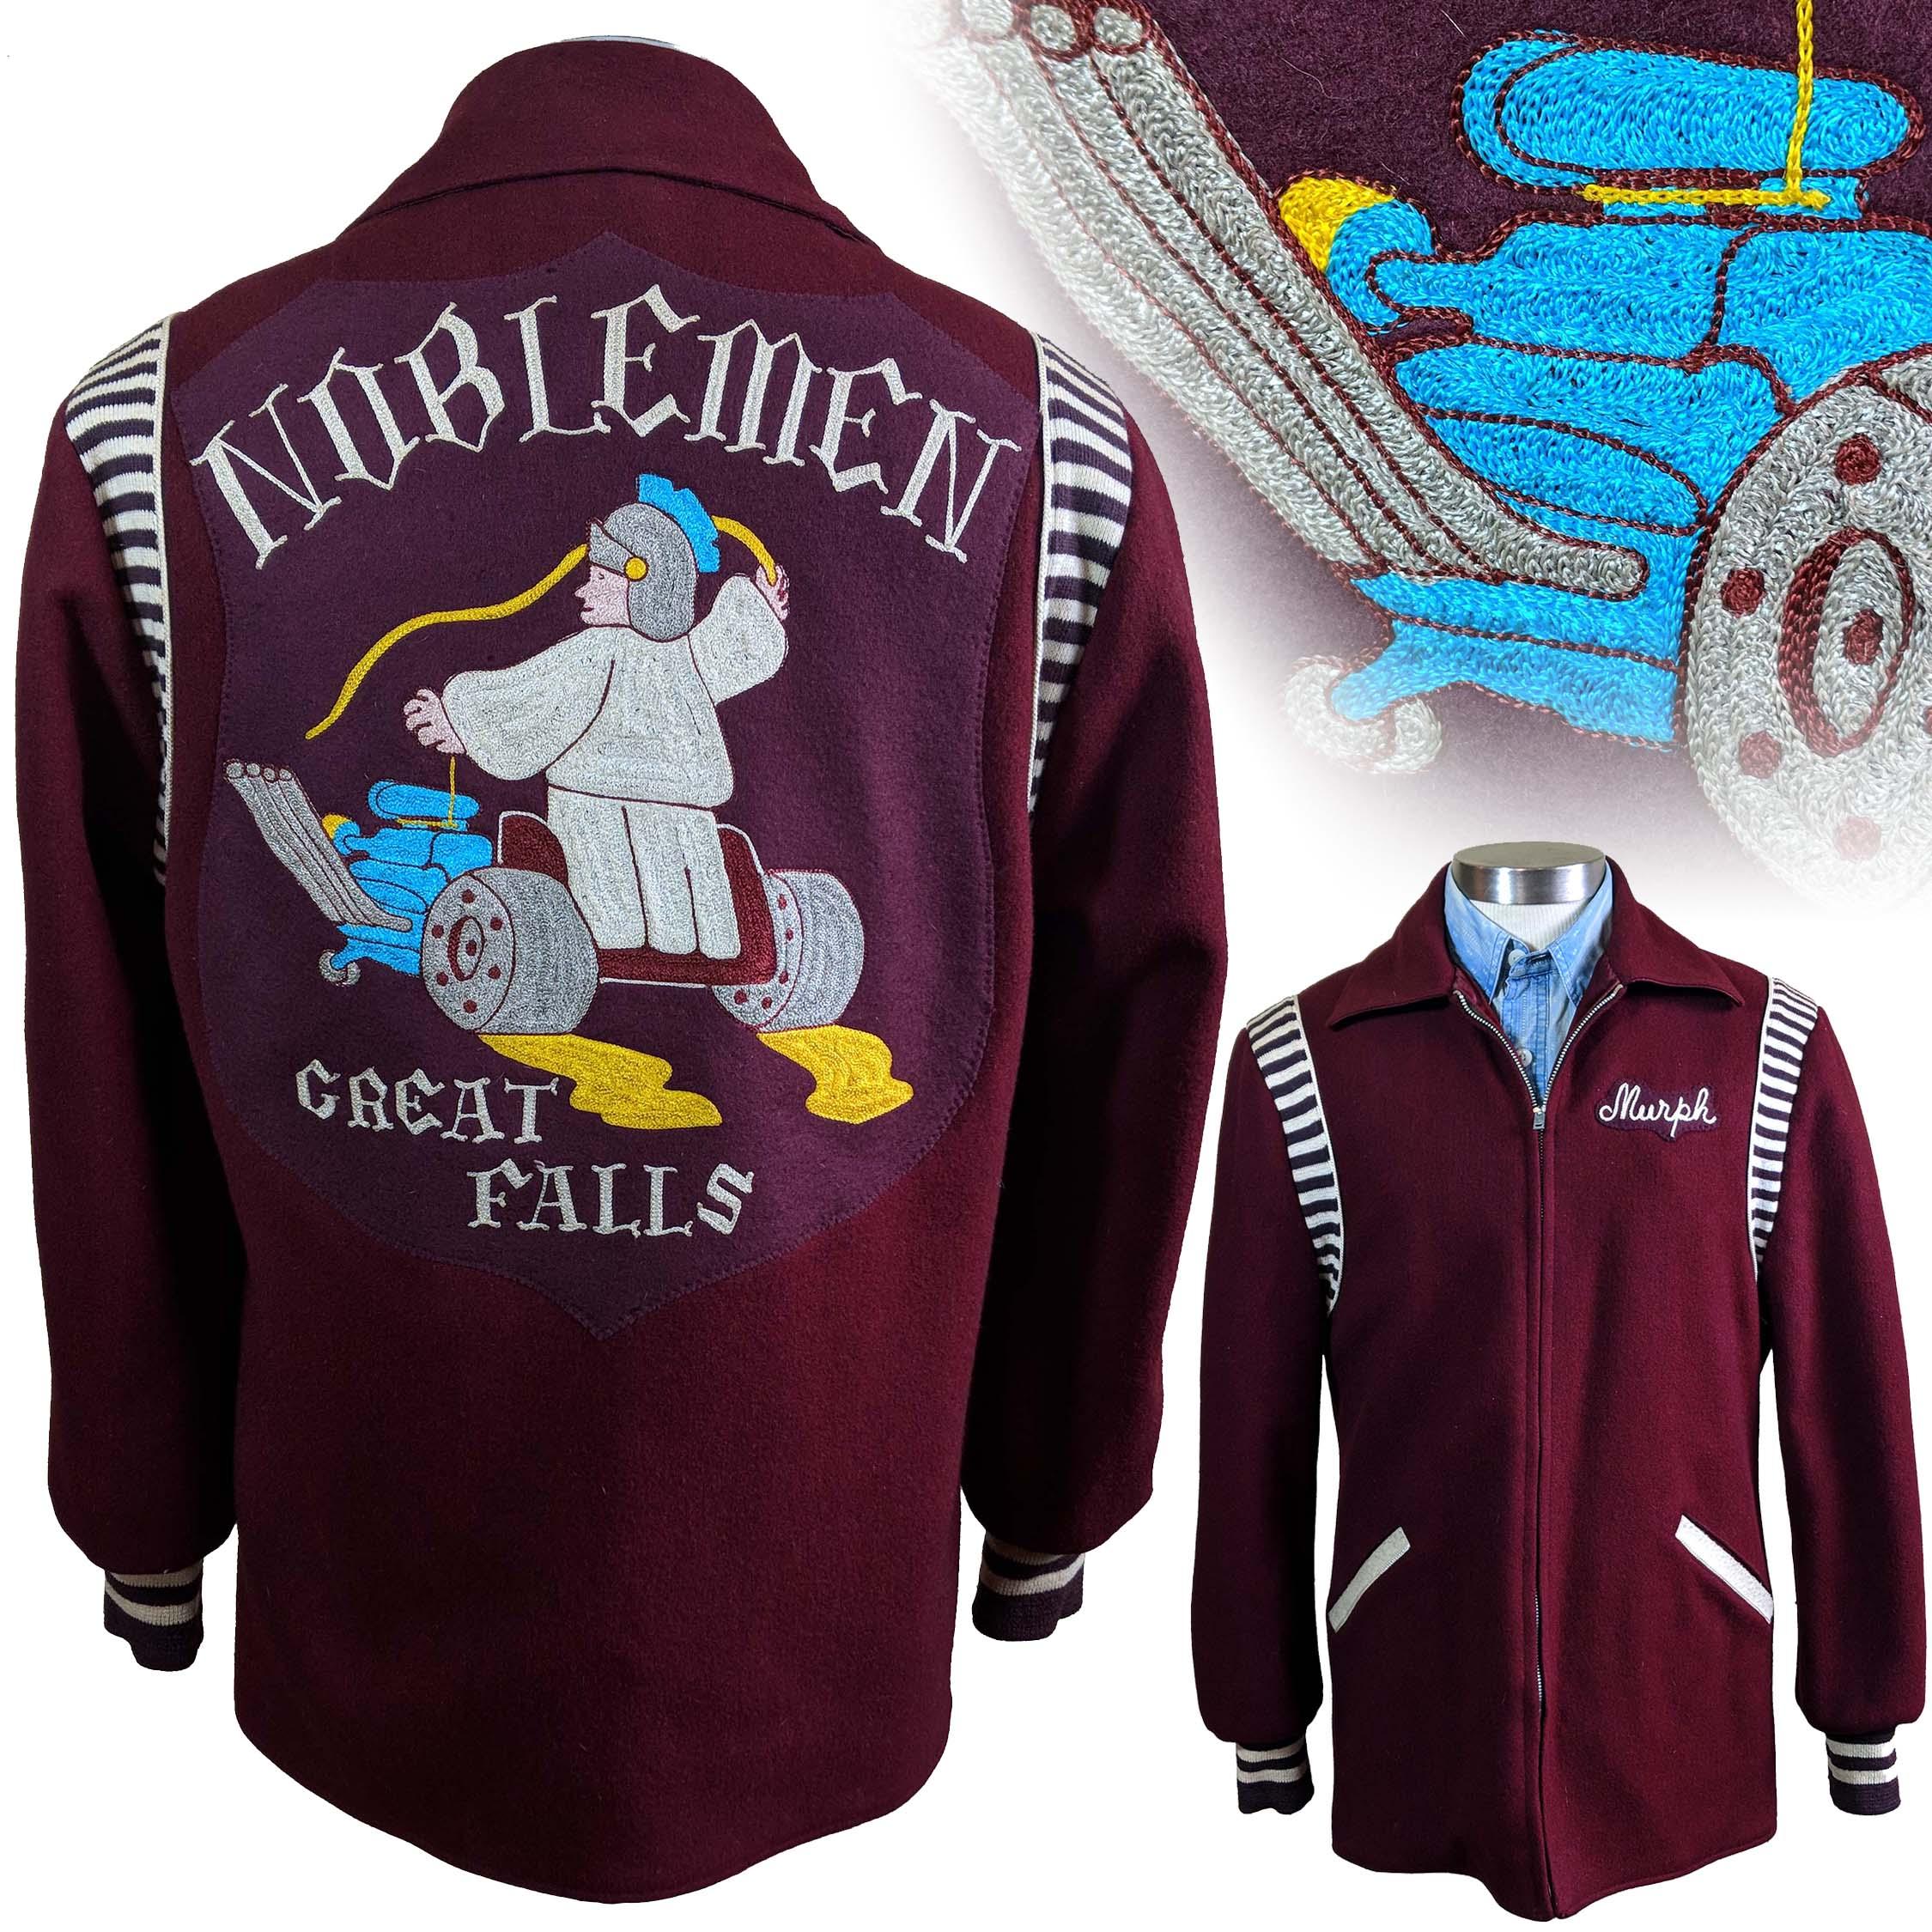 Noblemen Car Club Jacket Vintage Haberdashers Blog